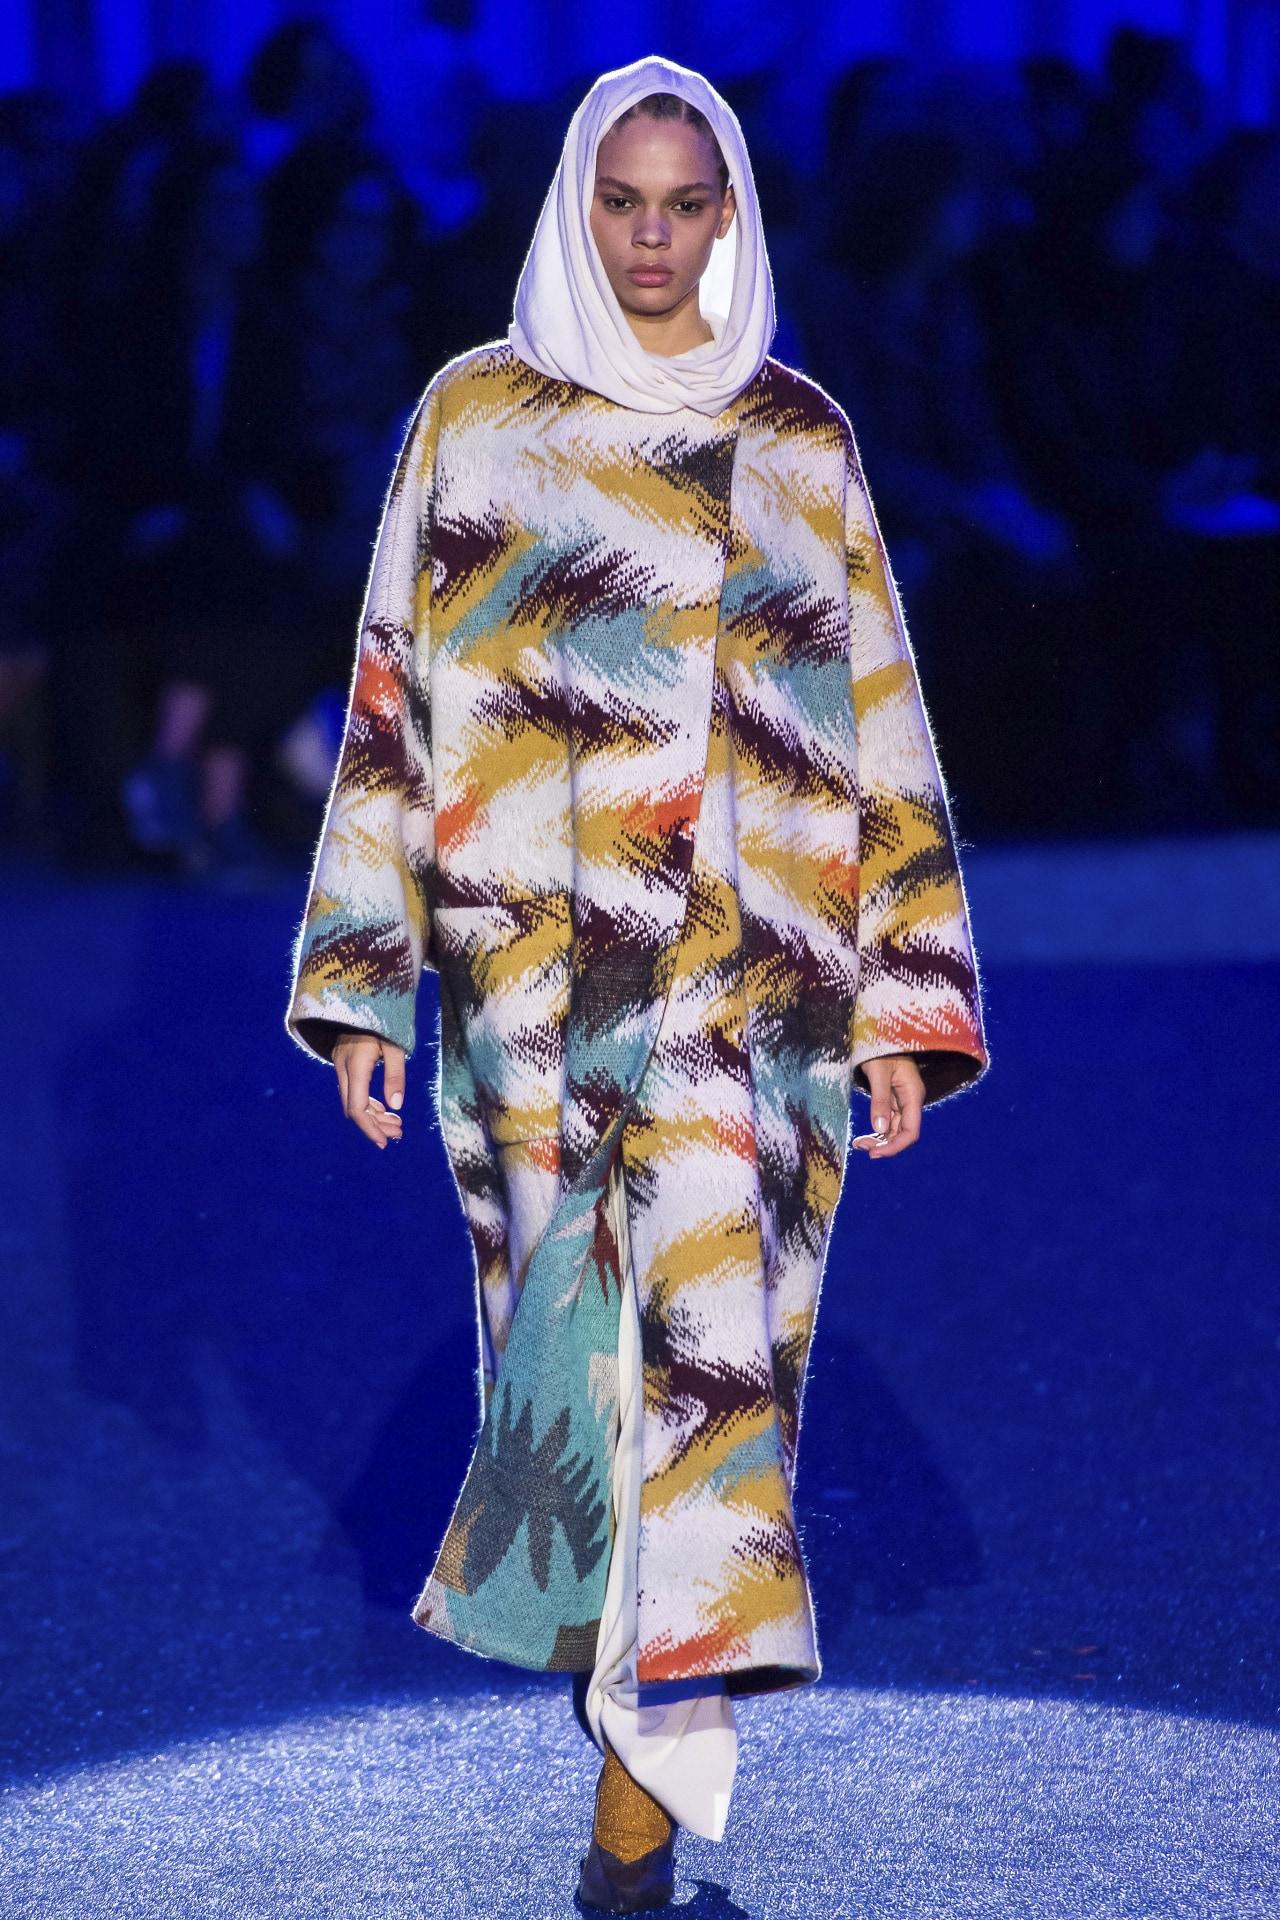 Missoni ready-to-wear autumn/winter '19/'20. Image credit: Gorunway.com